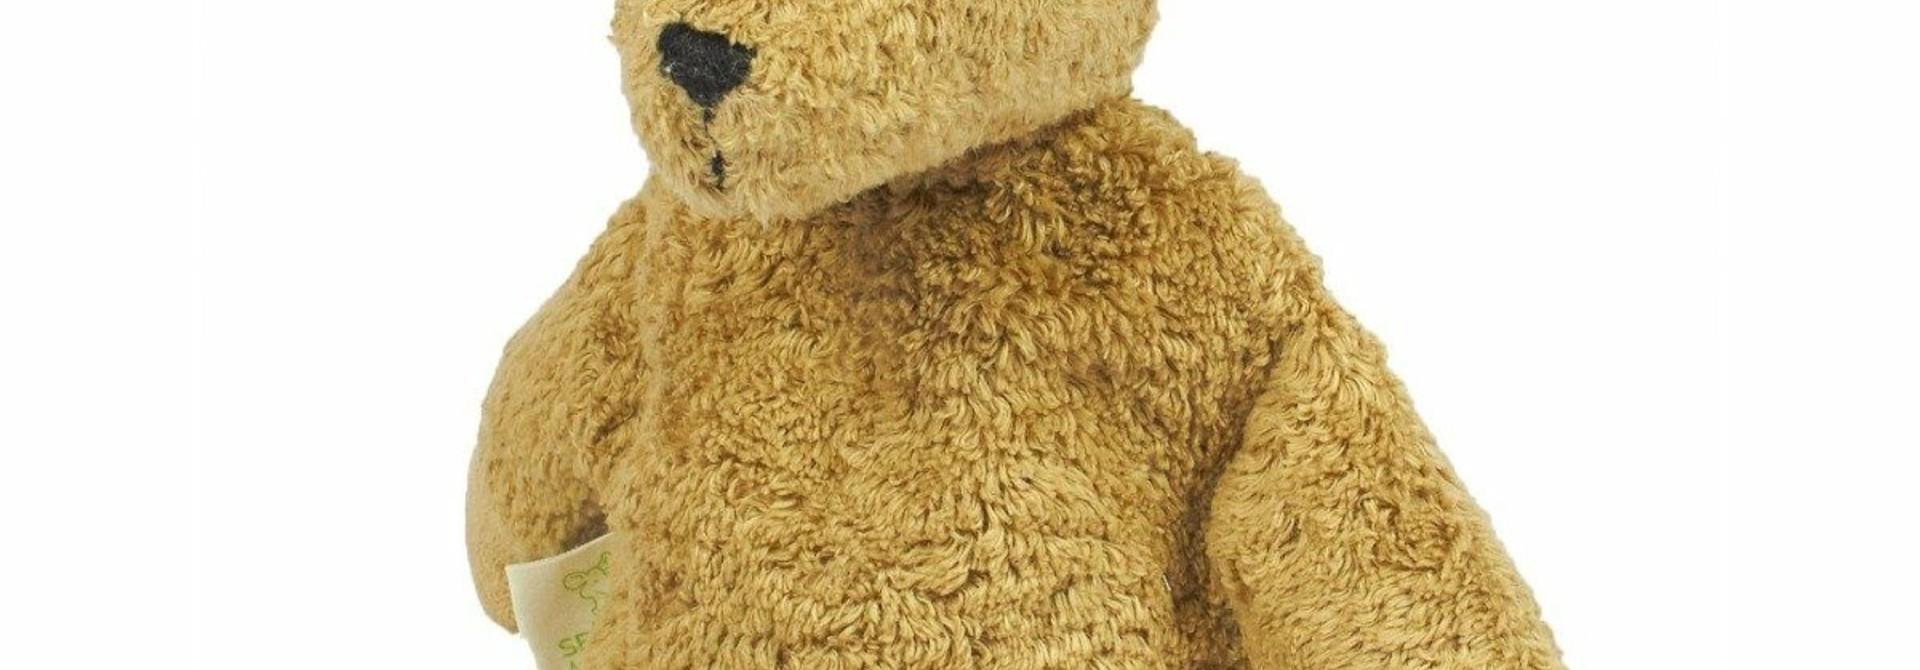 Cuddly animal Bear small